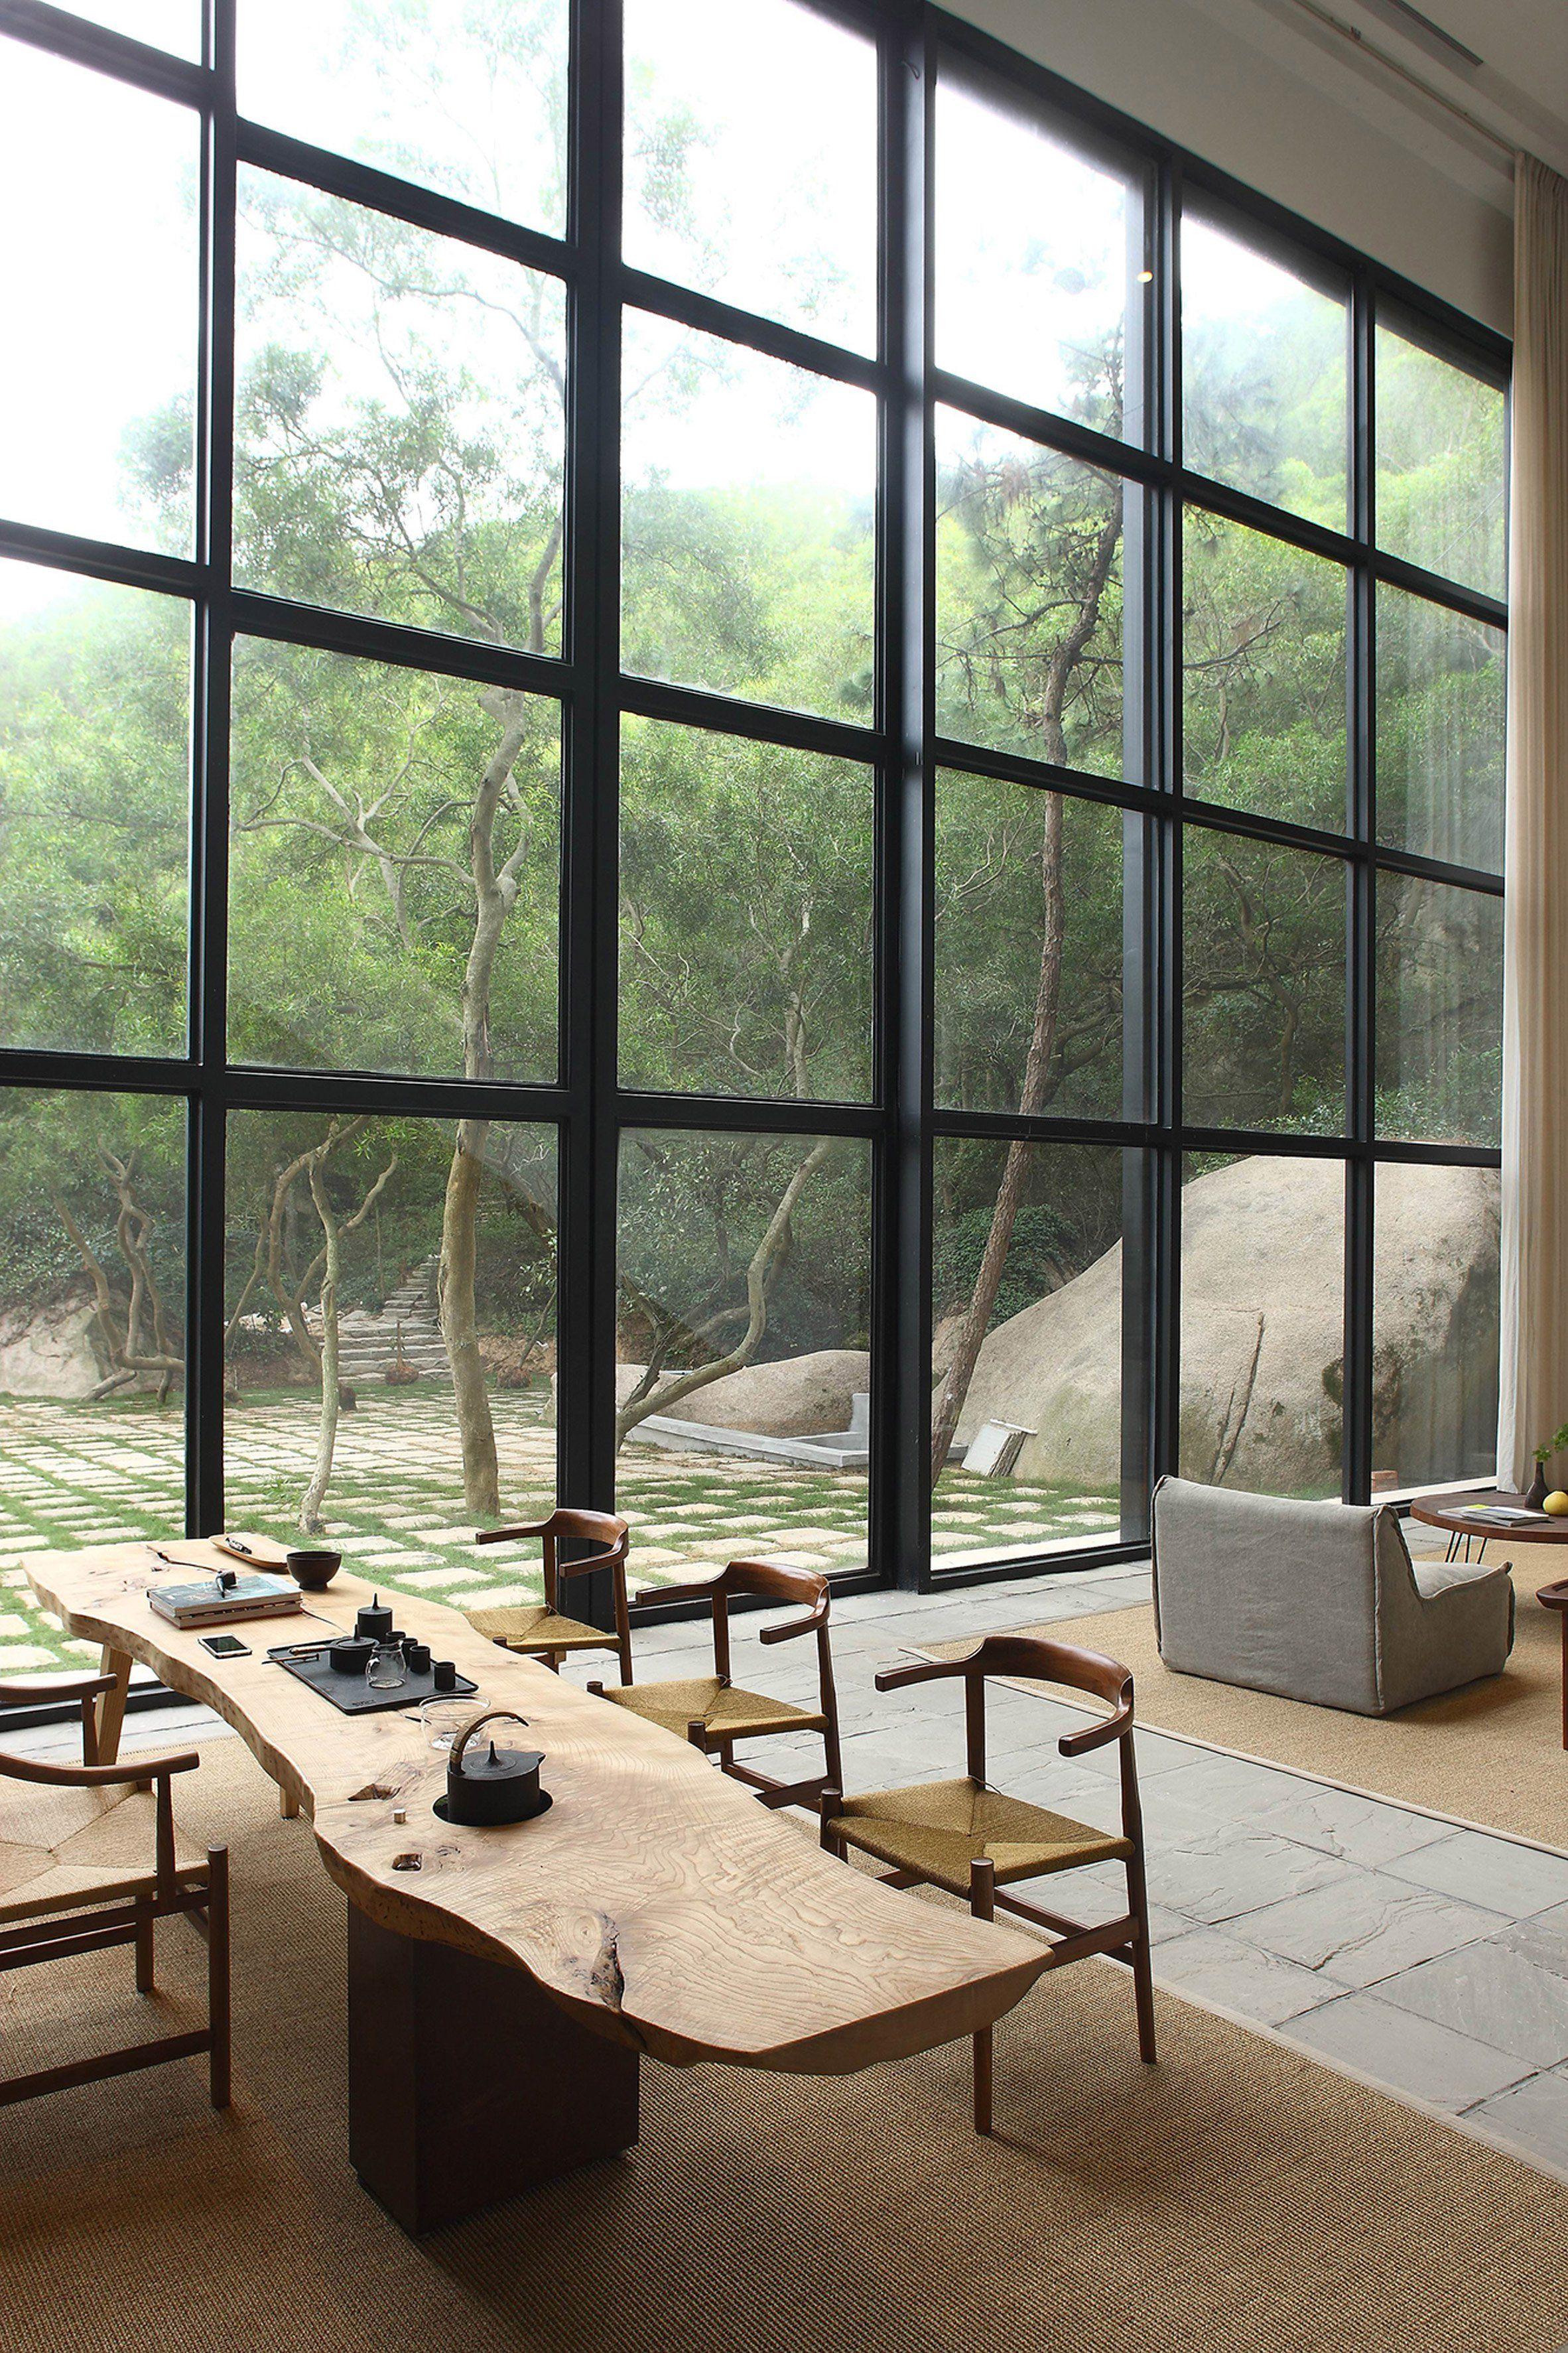 Modern window house design  pin by kristina mueller on finca  pinterest  interior interior